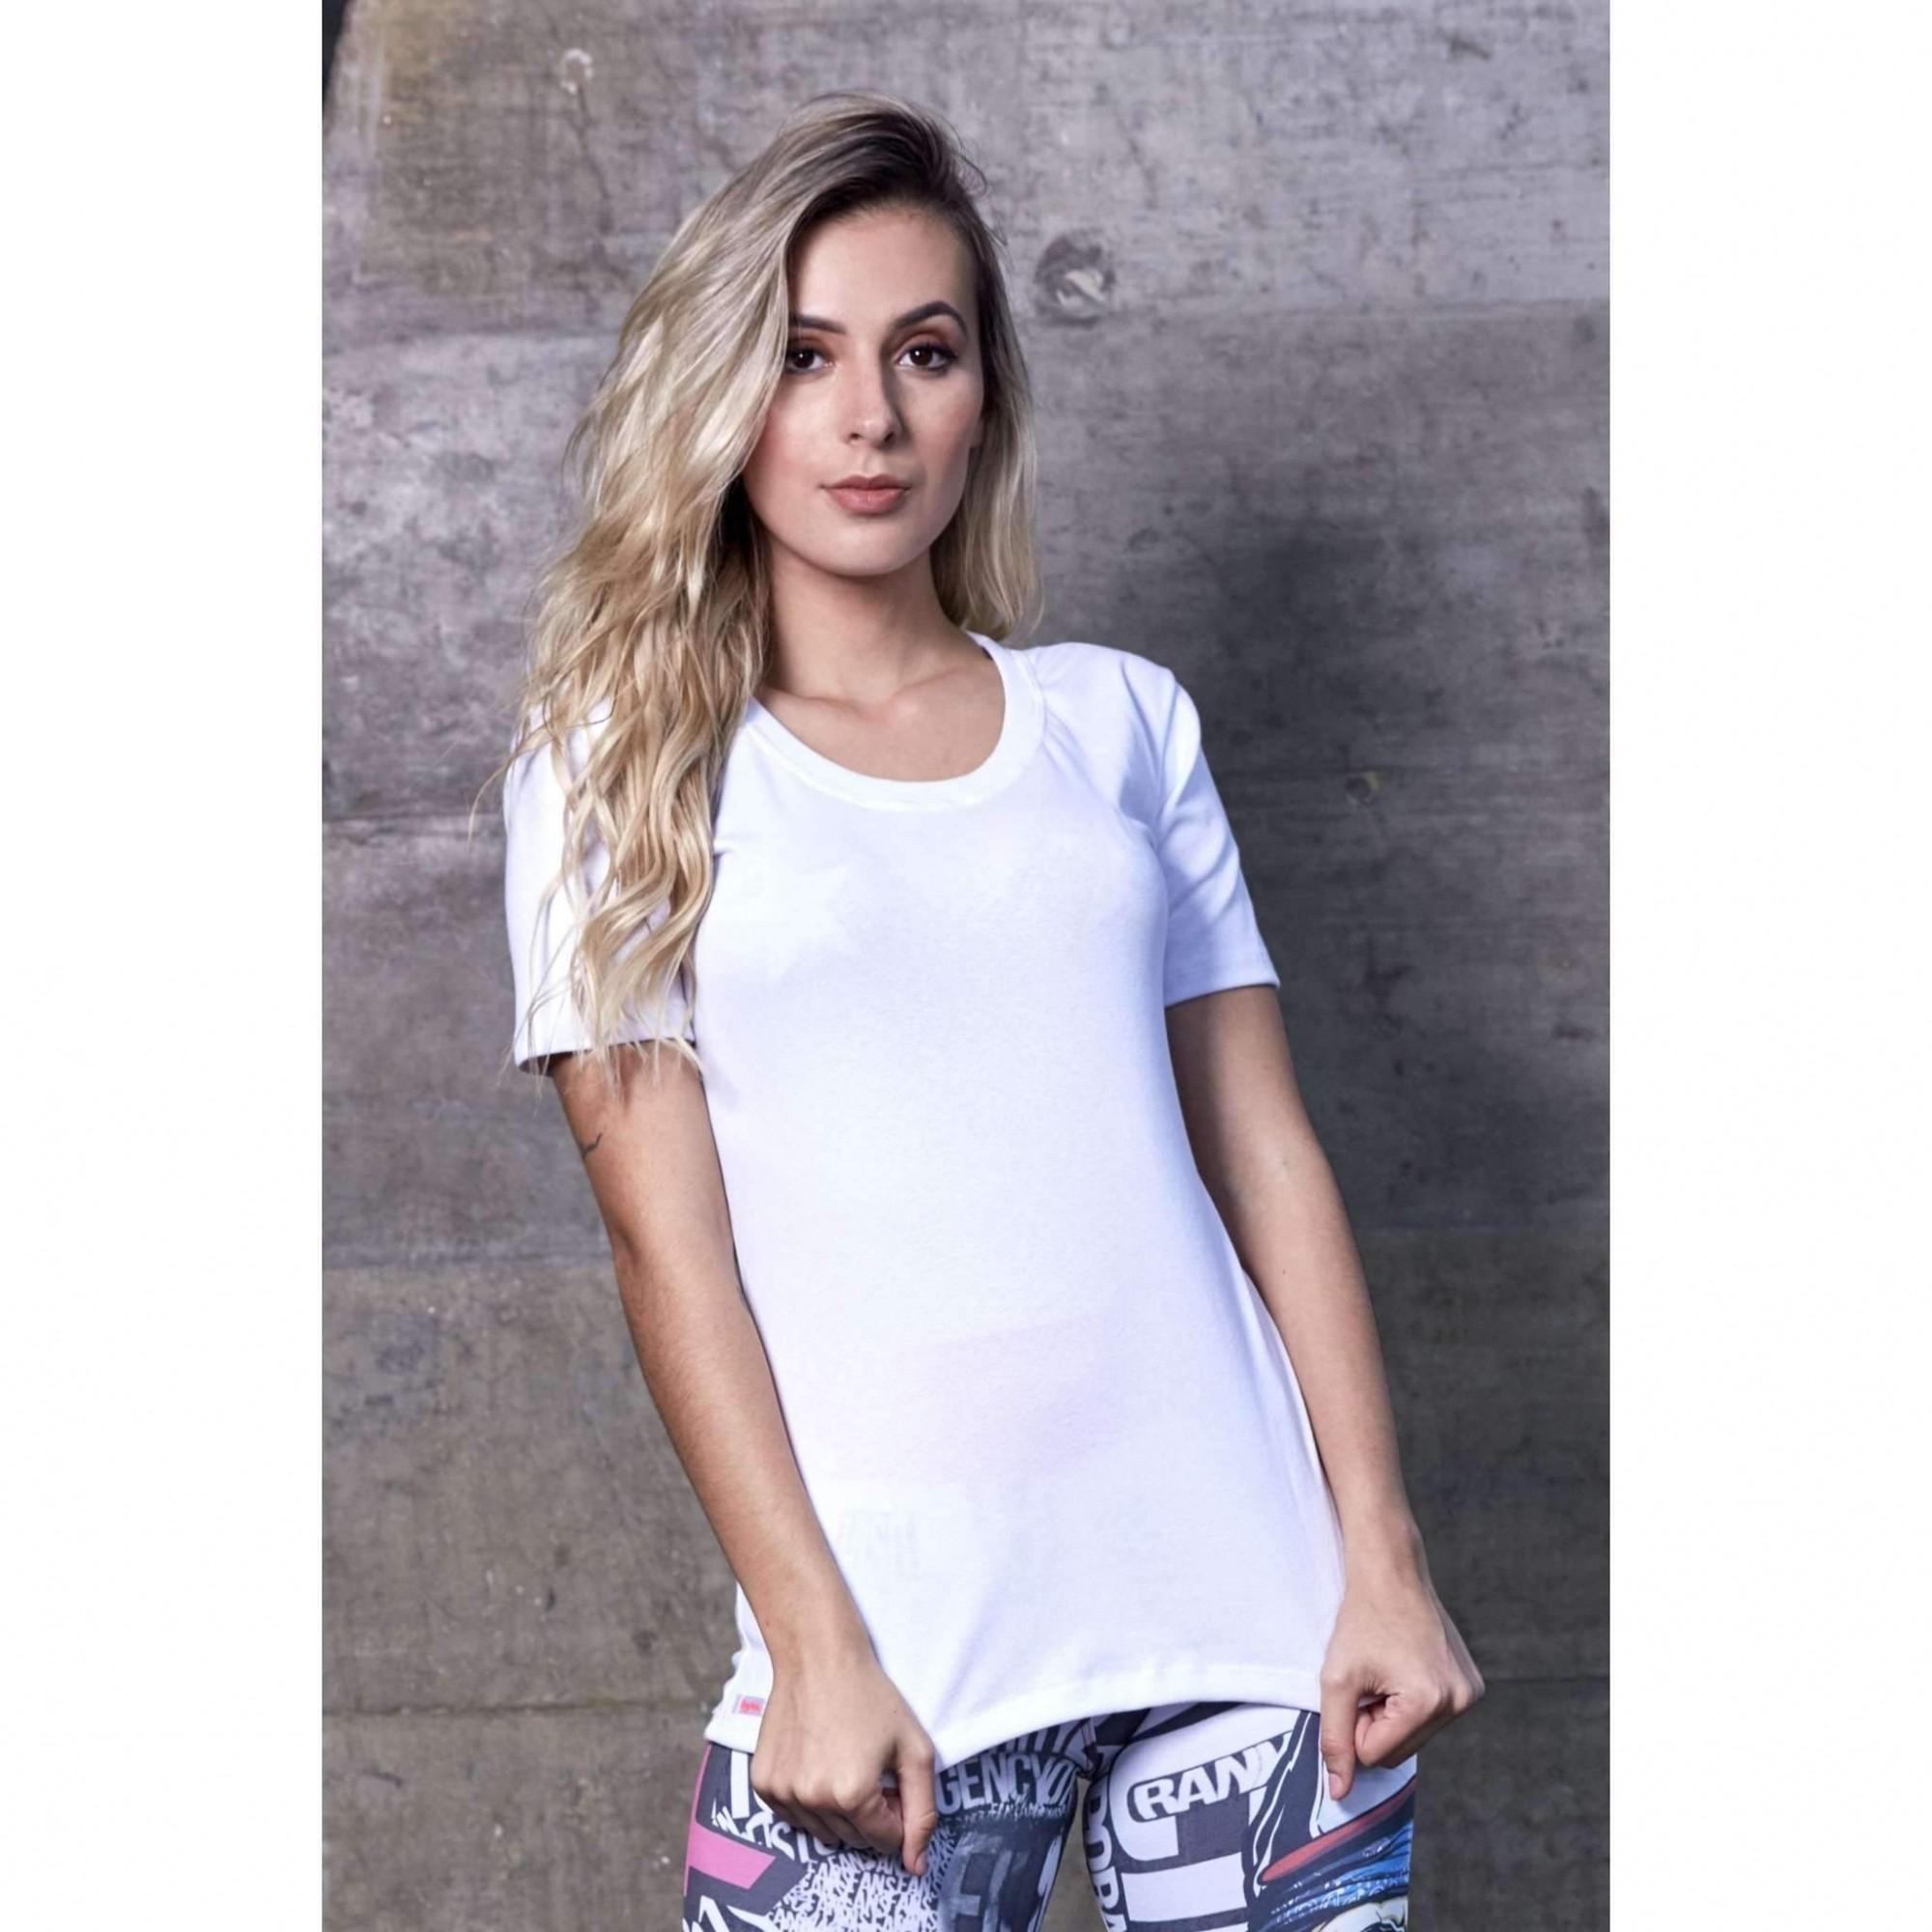 Camiseta Feminina Fitness Blusa Fitness Karla  - Fribasex - Fabricasex.com